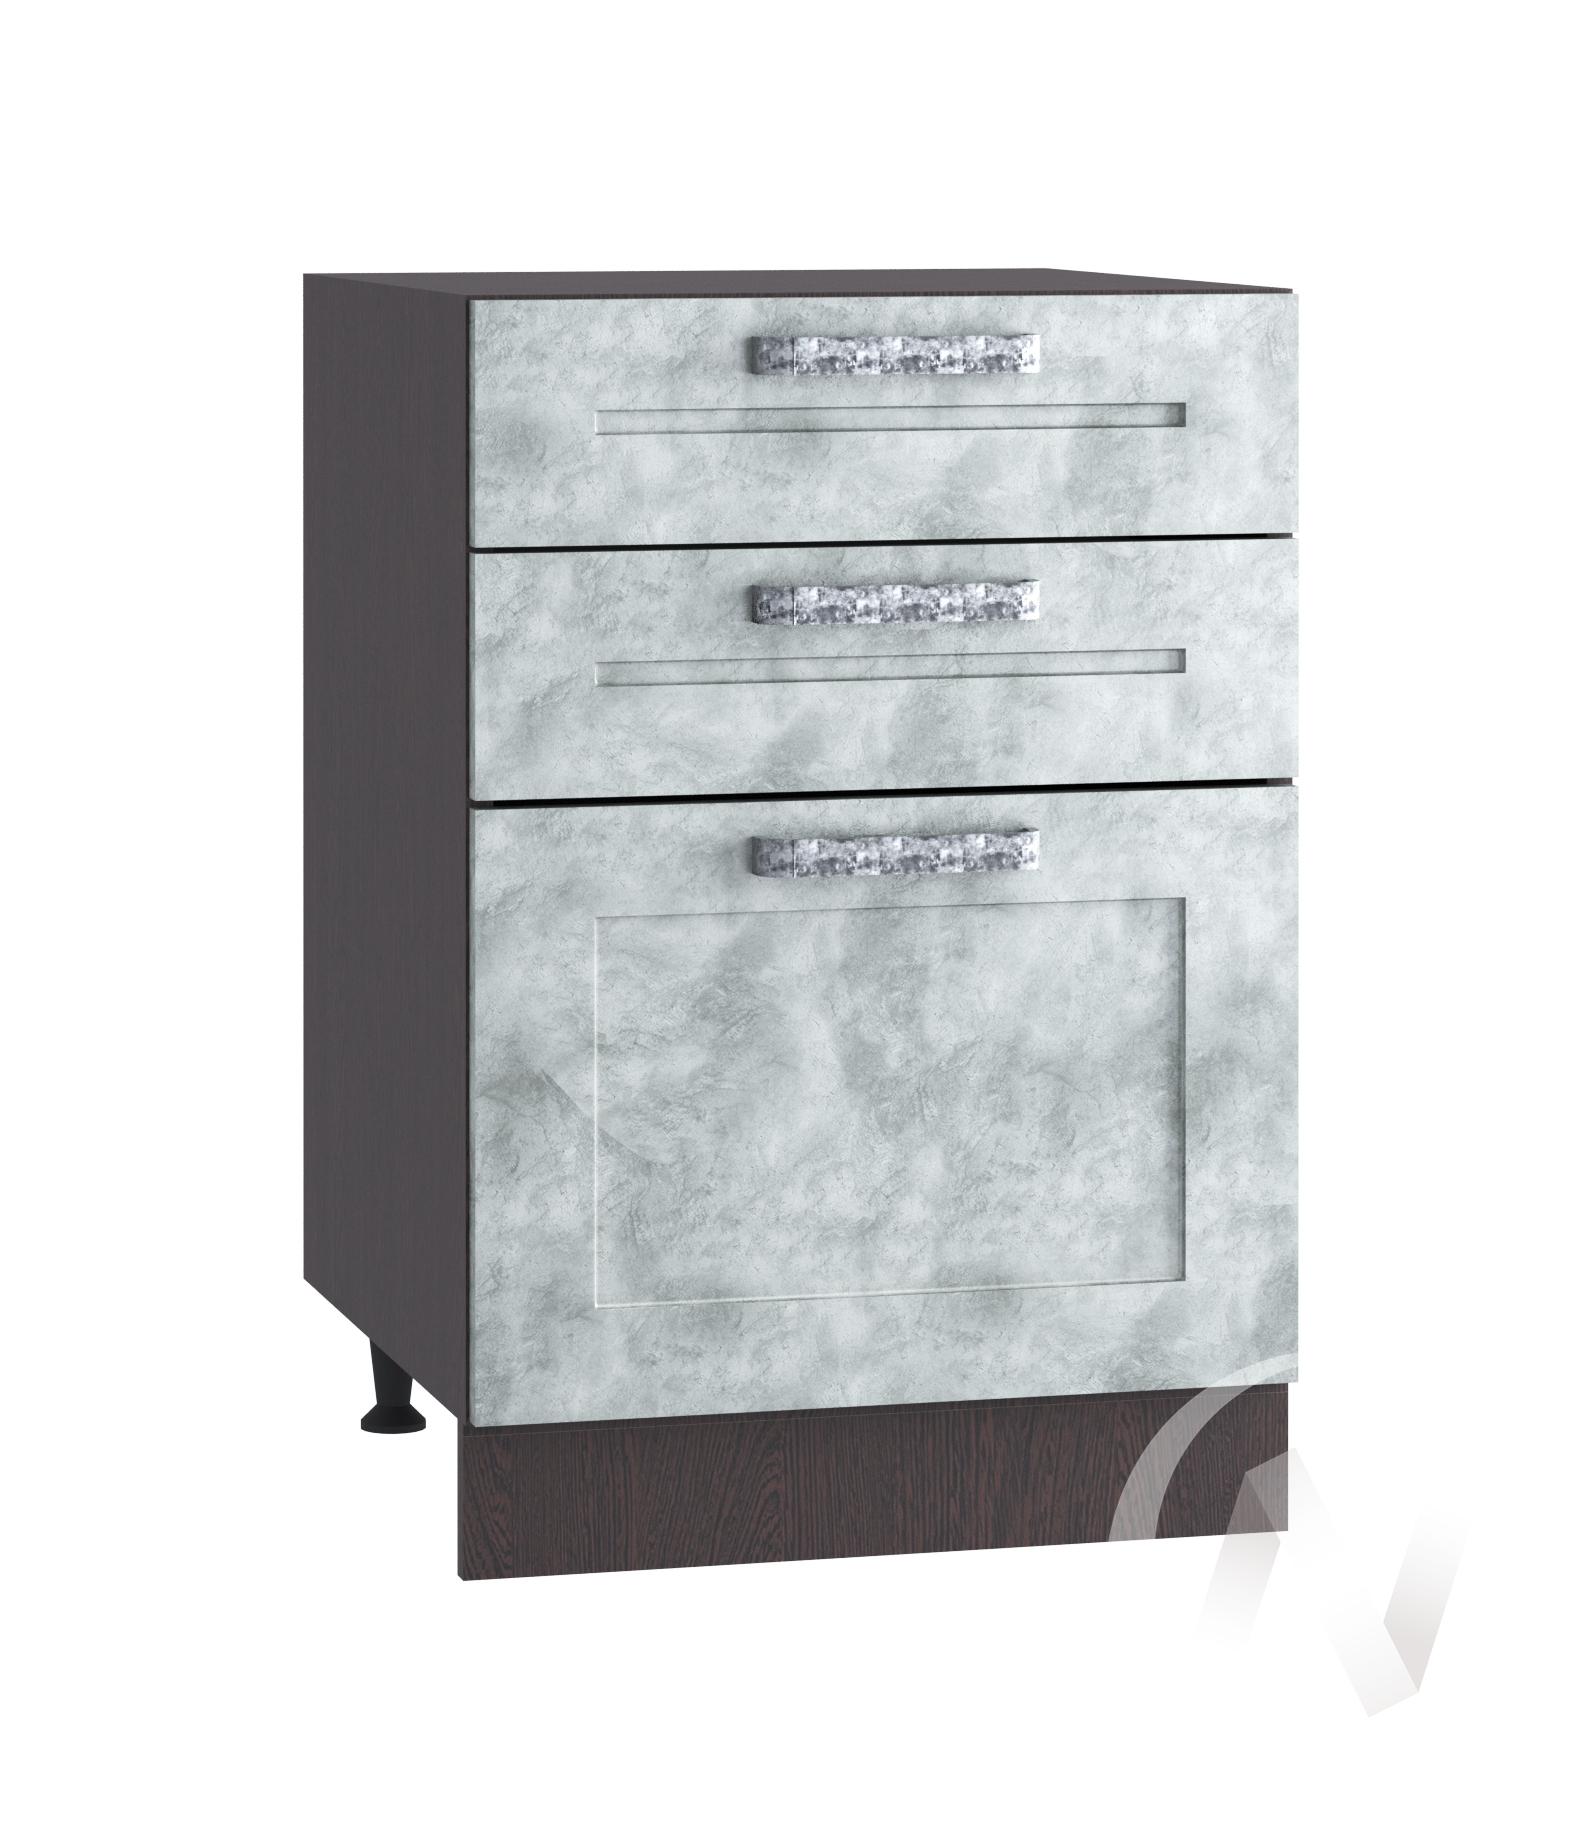 "Кухня ""Лофт"": Шкаф нижний с 3-мя ящиками 500, ШН3Я 500 (Бетон серый/корпус венге)"